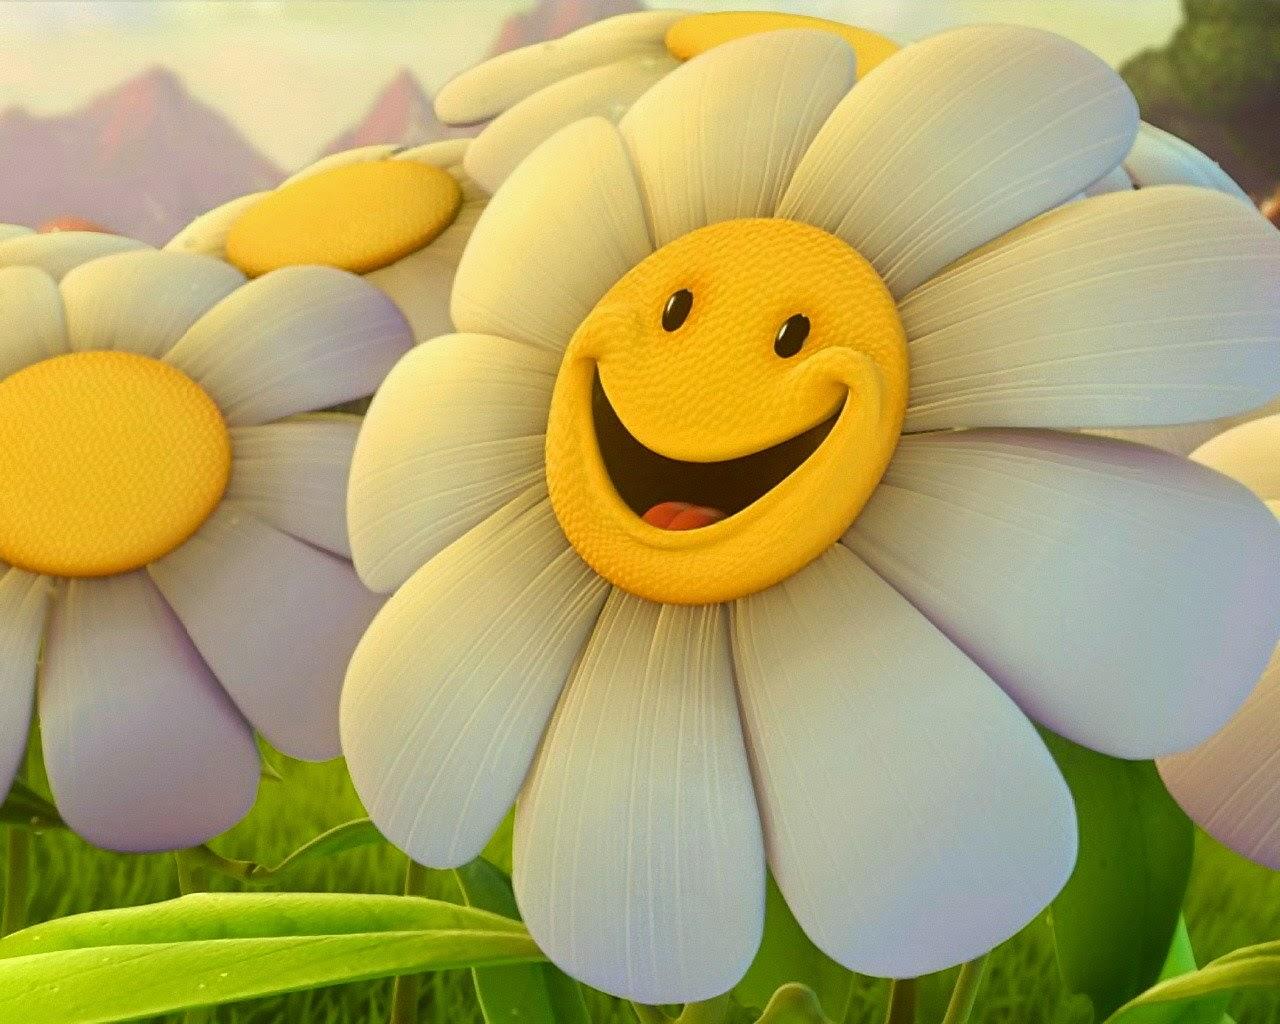 Gambar Bunga Senyum Lucu Indah Terbaru